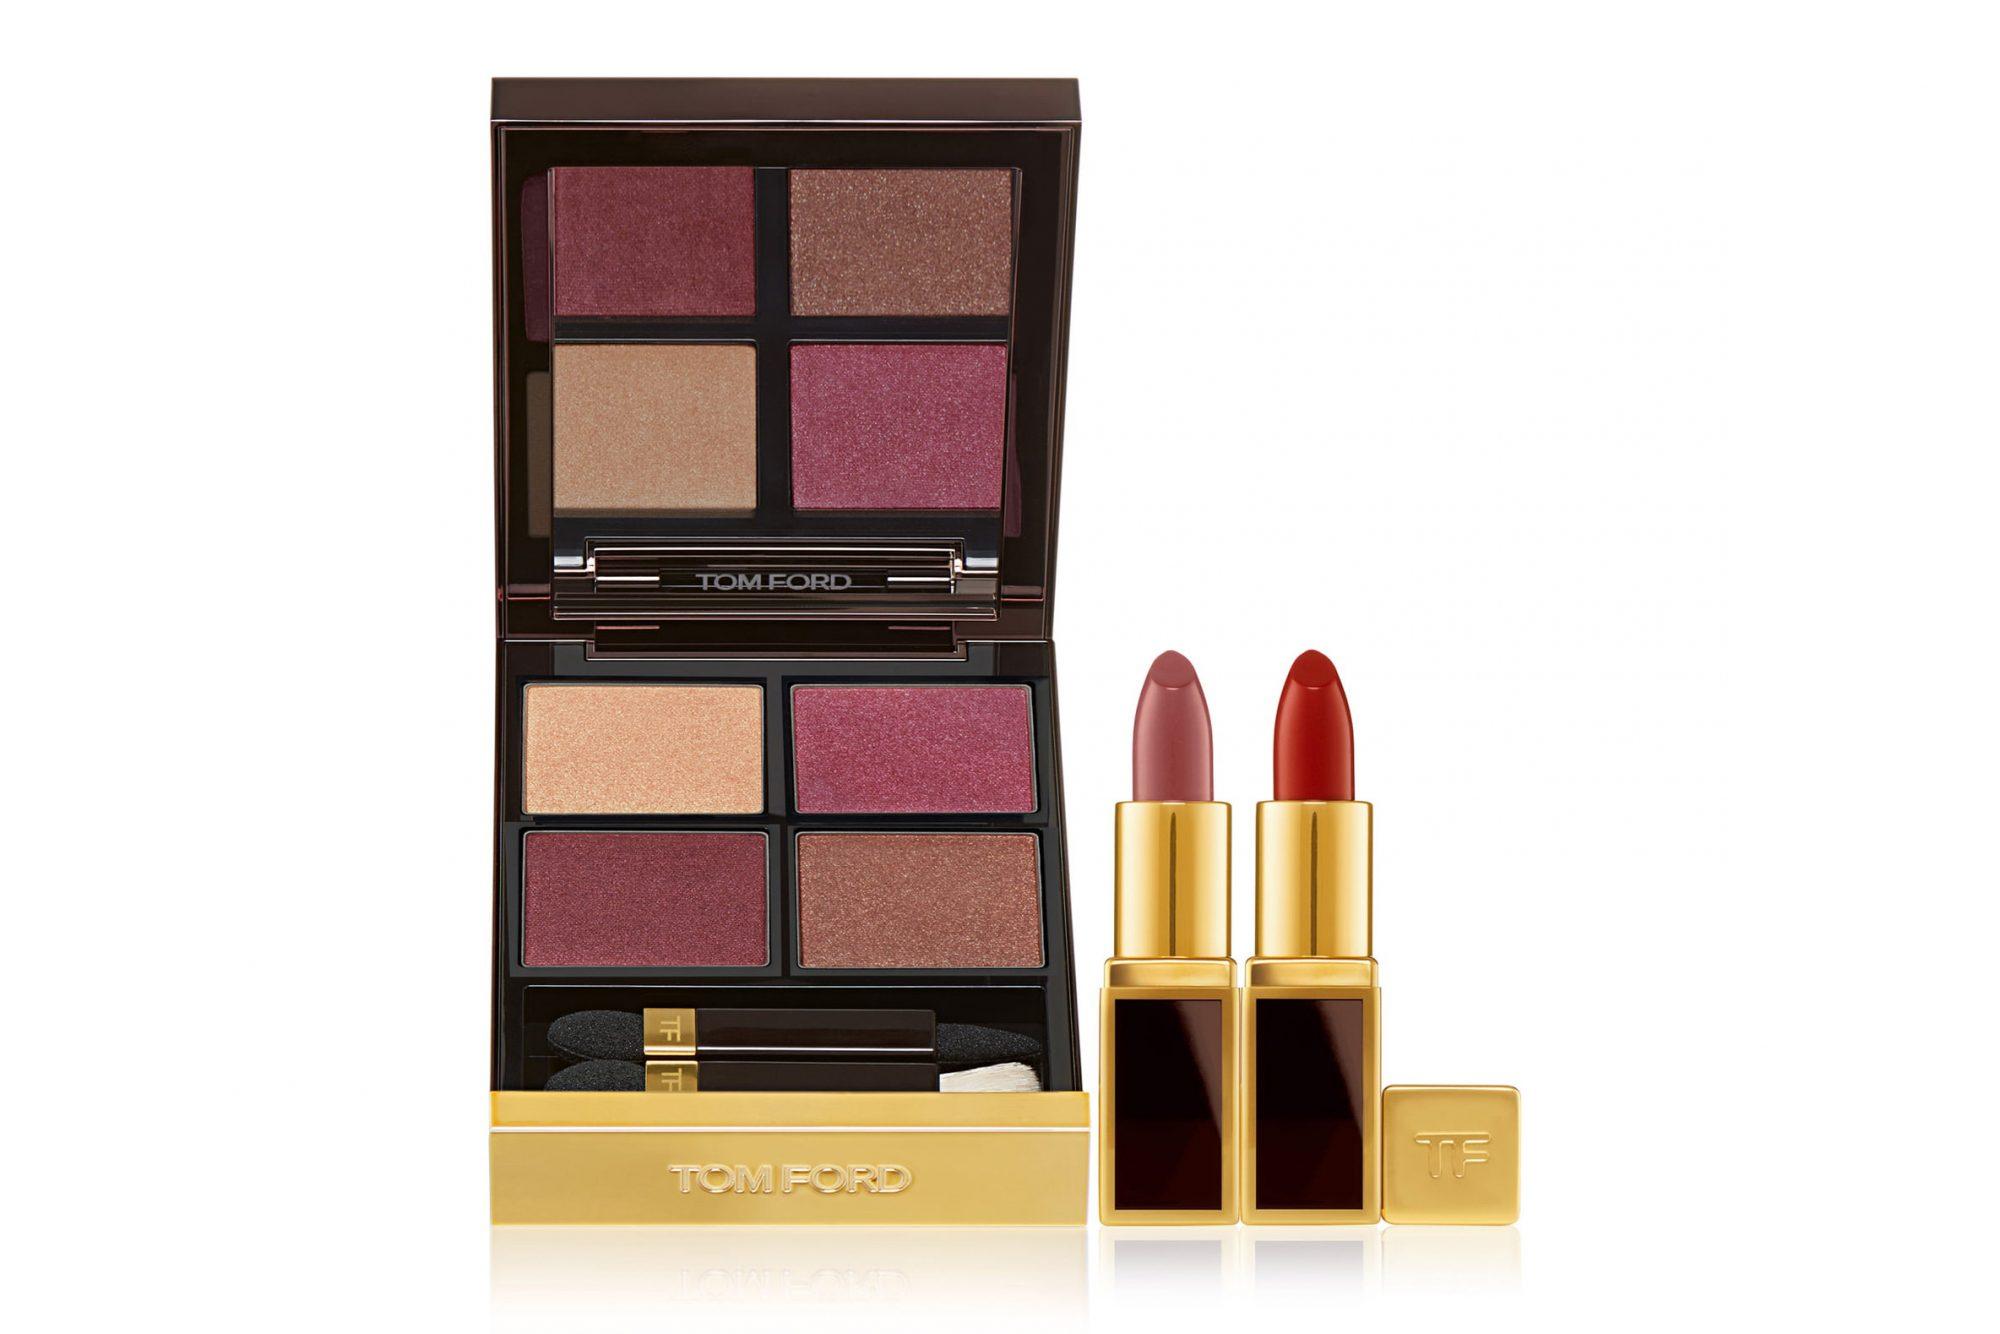 nordstrom anniversary sale beauty deals